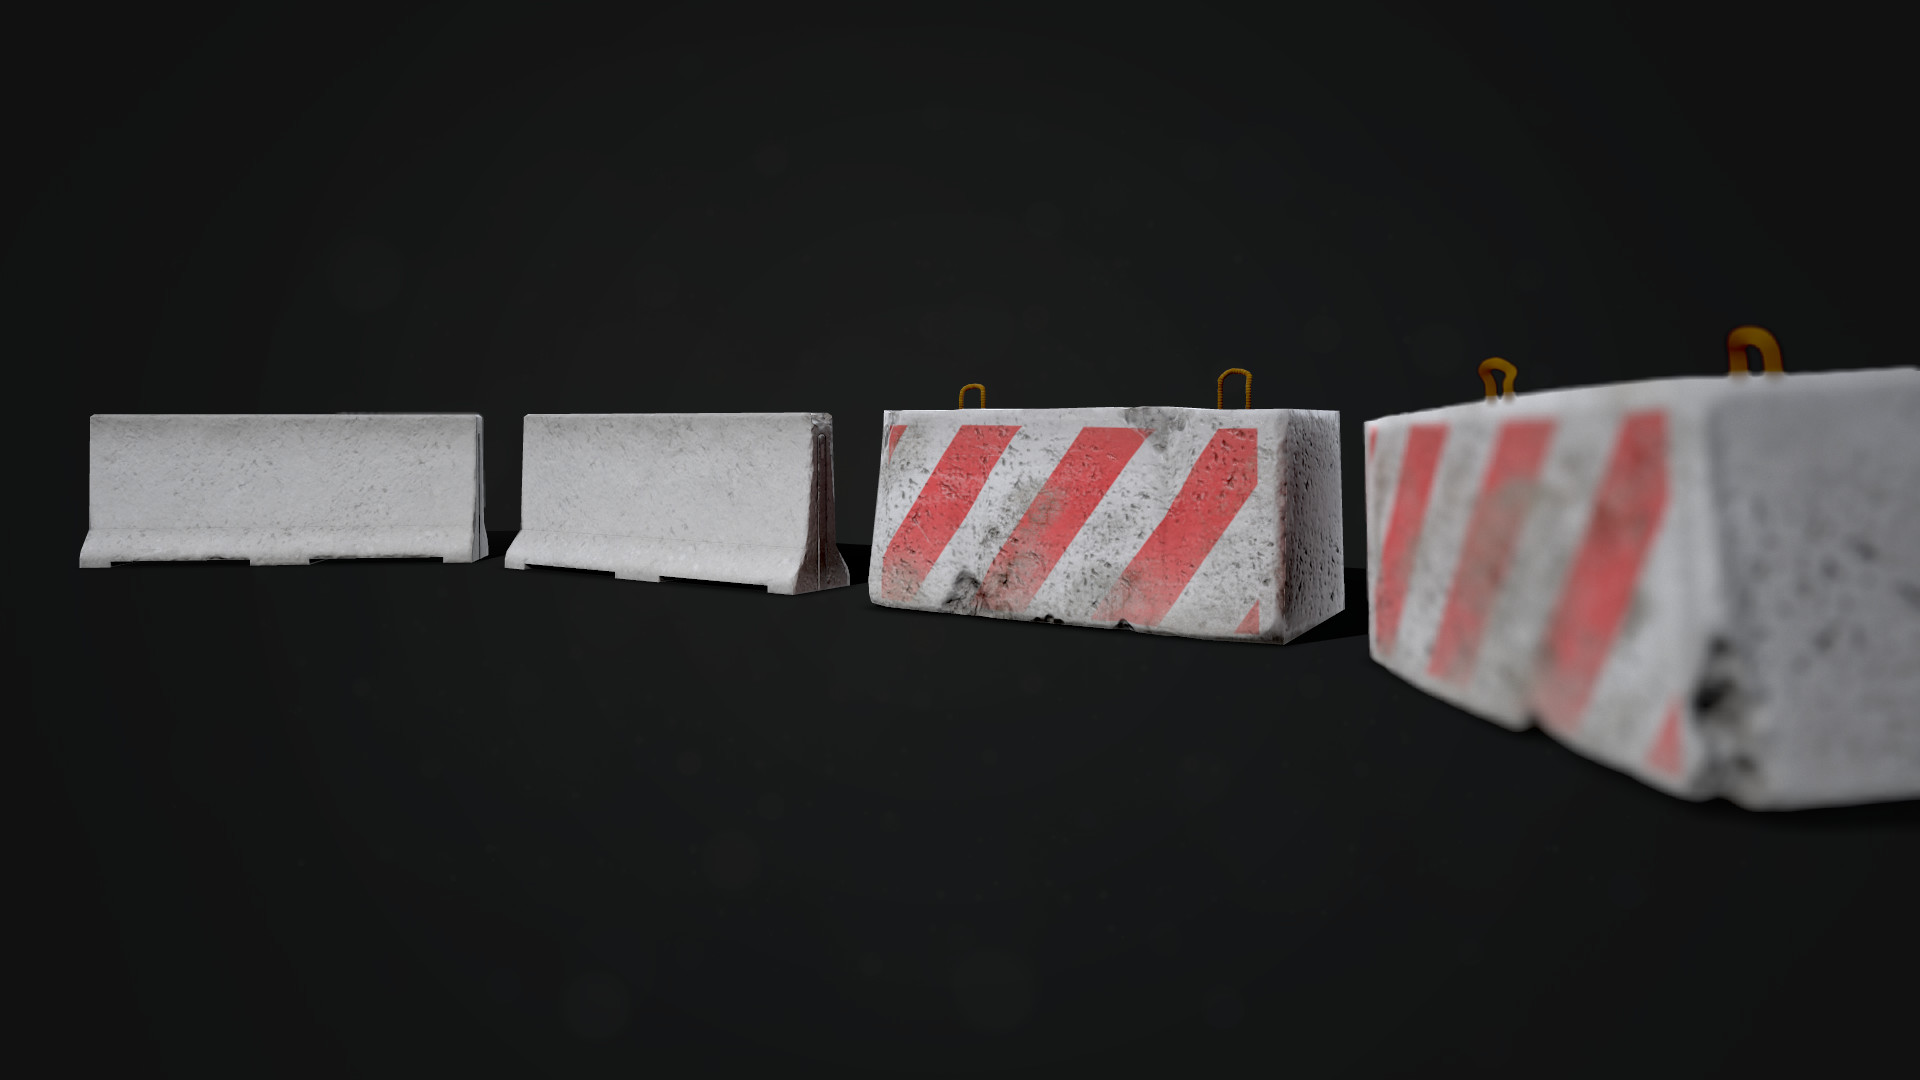 Christoffer sjostrom concreteroadblocksrow2